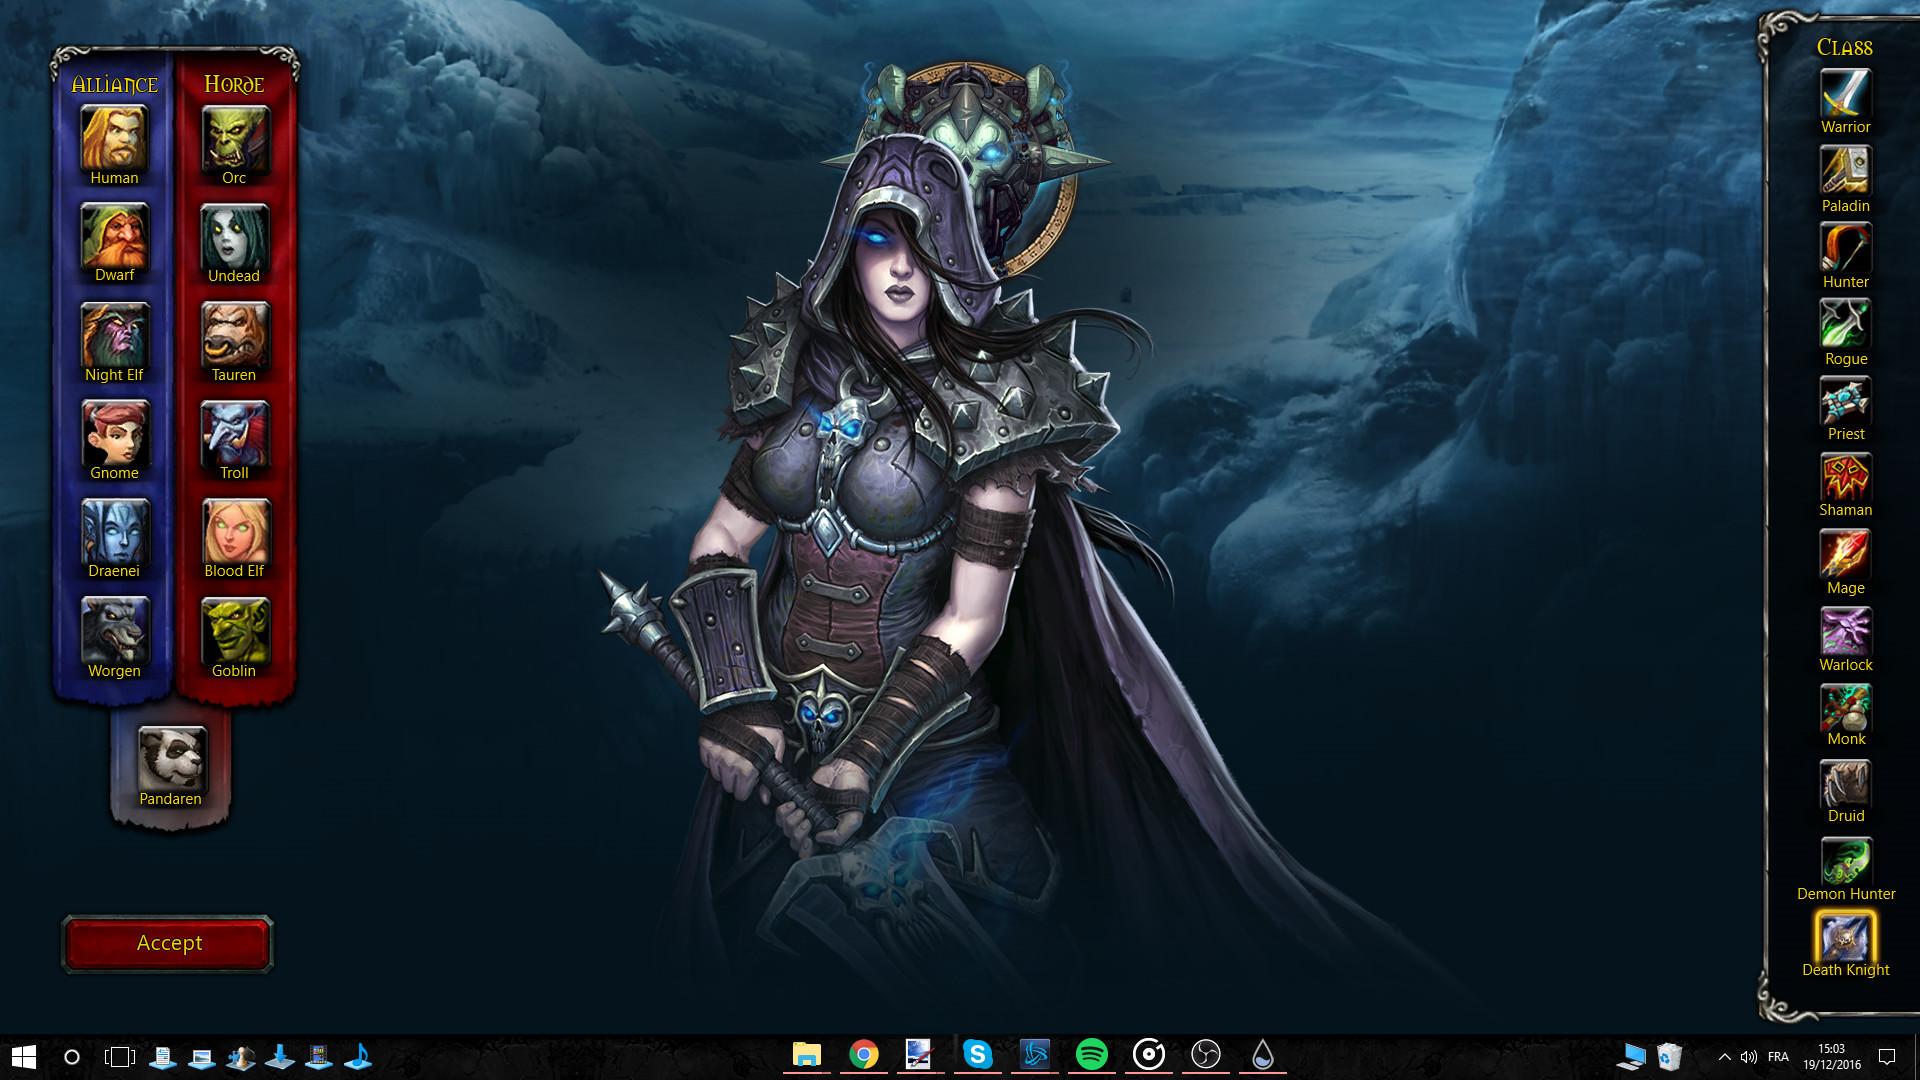 … World of Warcraft Rainmeter Interactive Wallpaper by Akmos37